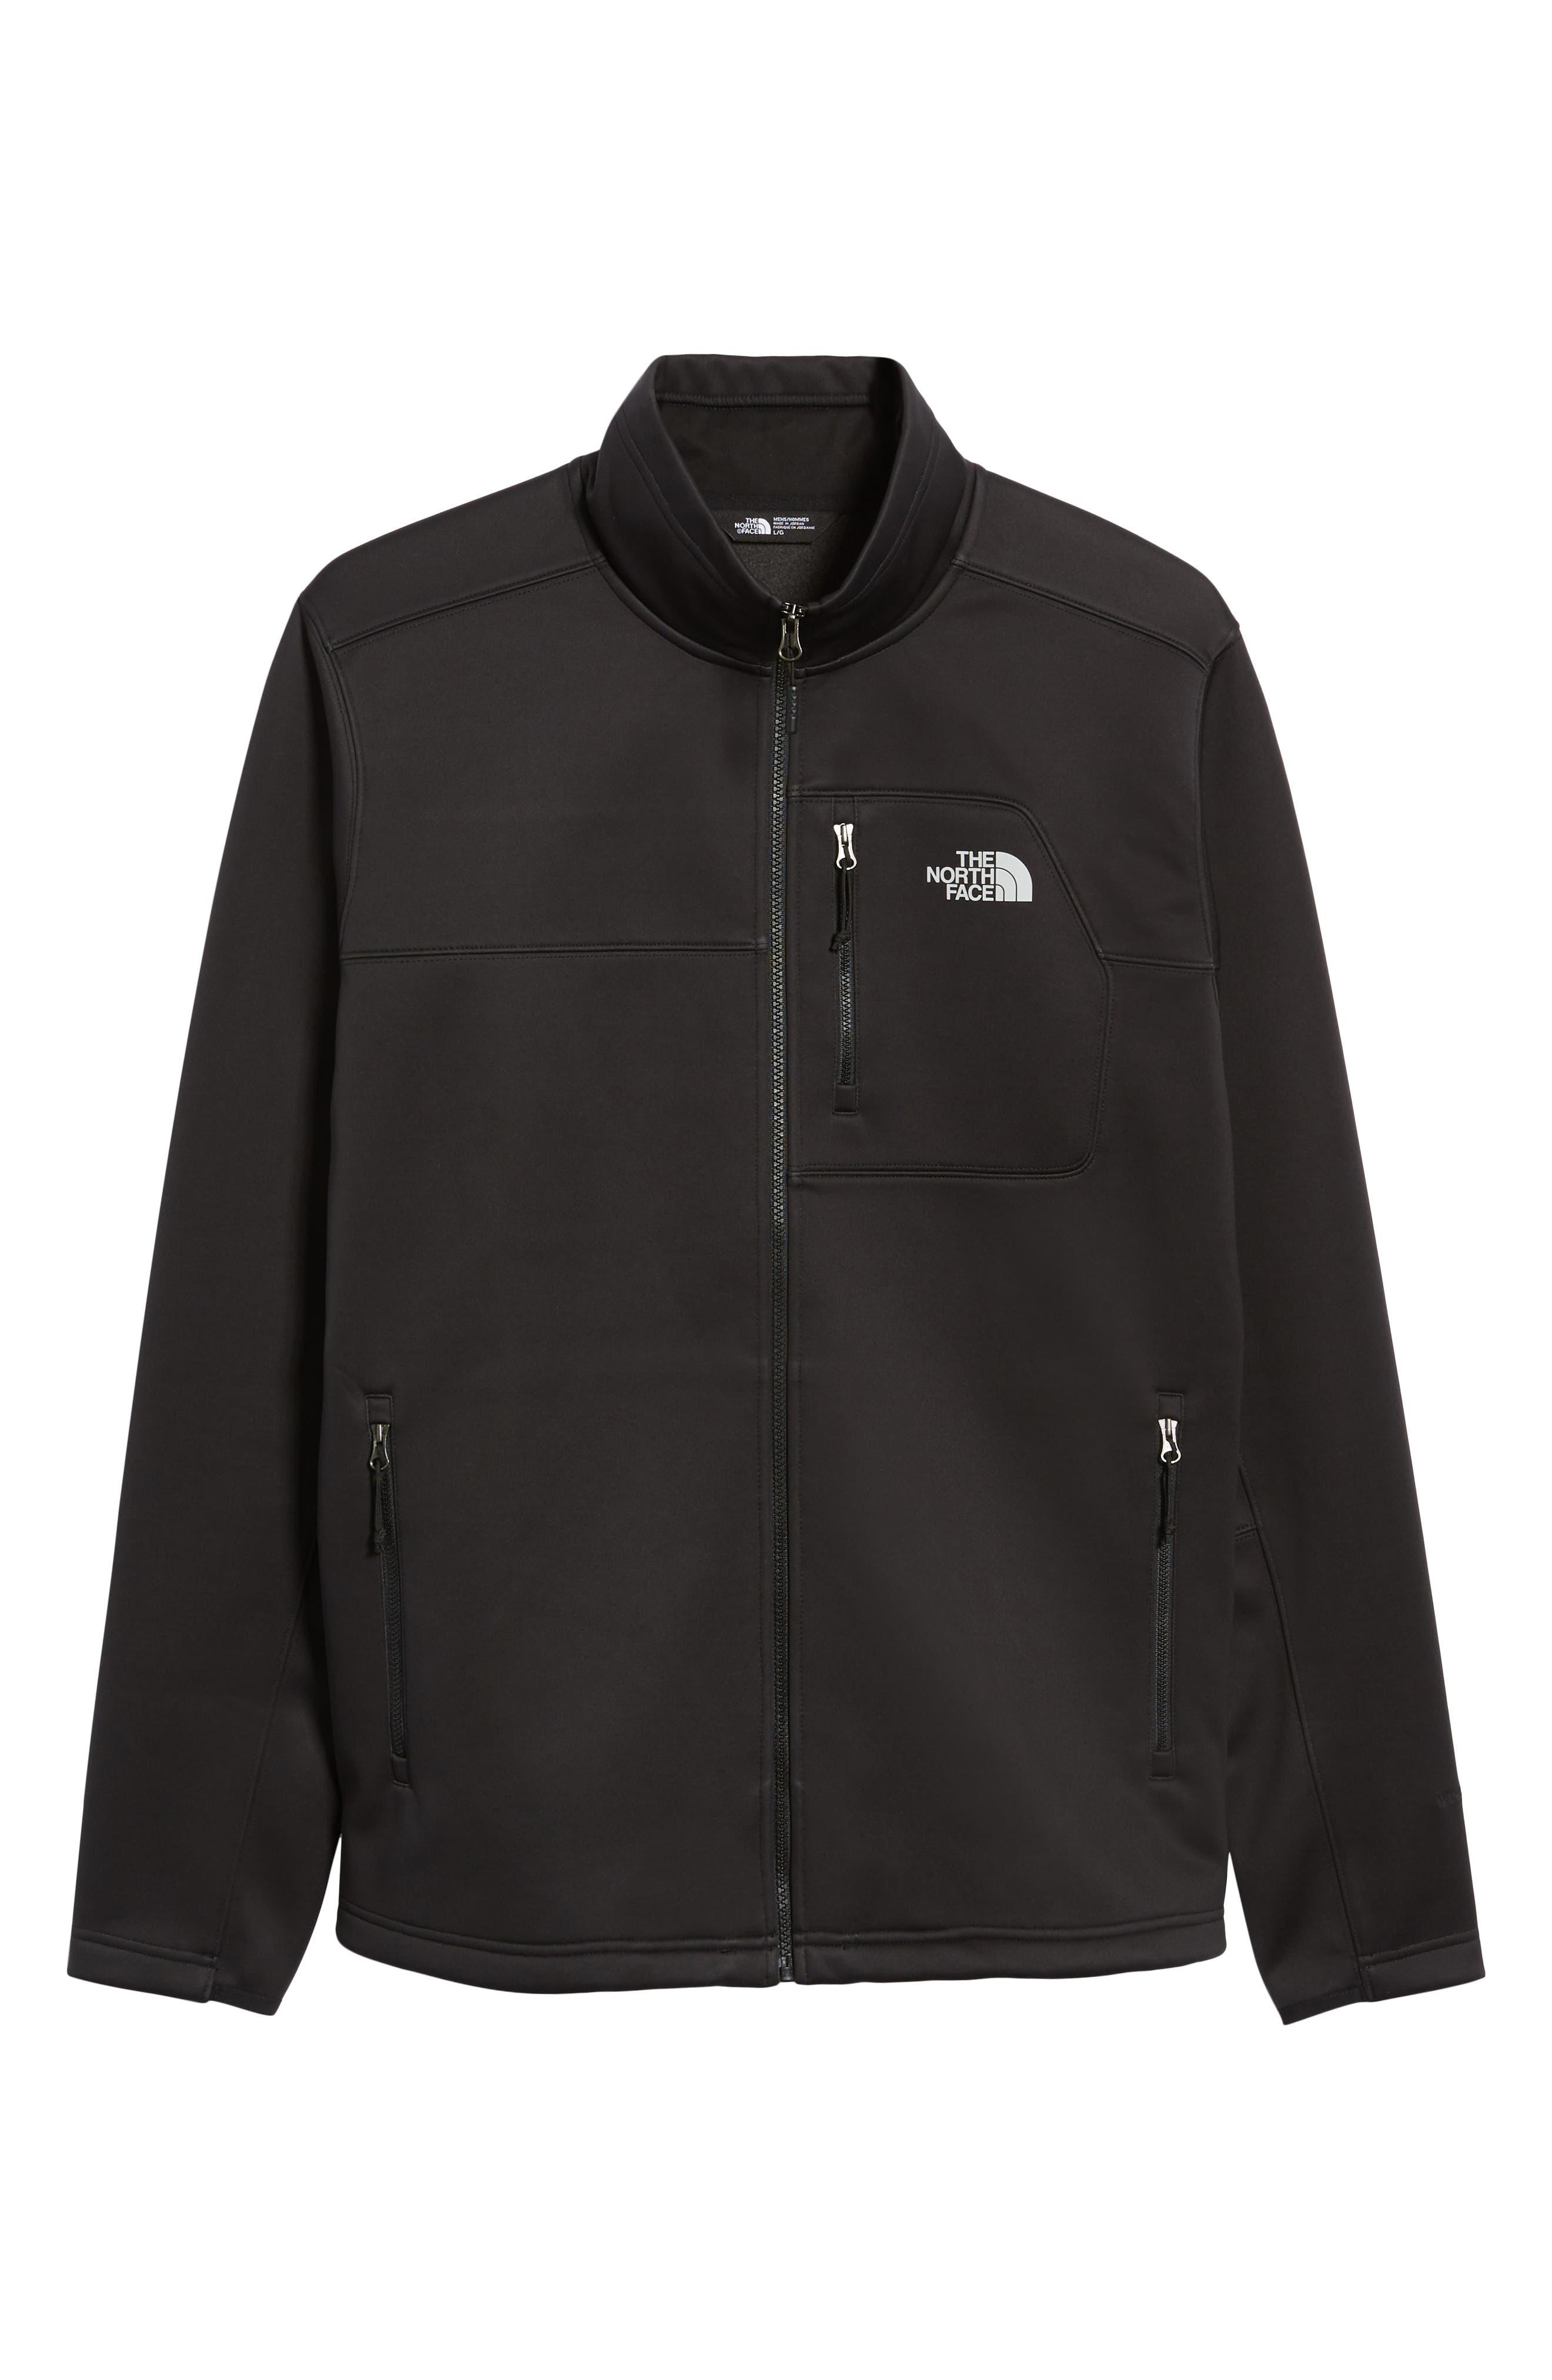 Apex Risor Jacket,                             Alternate thumbnail 7, color,                             TNF BLACK/ TNF BLACK